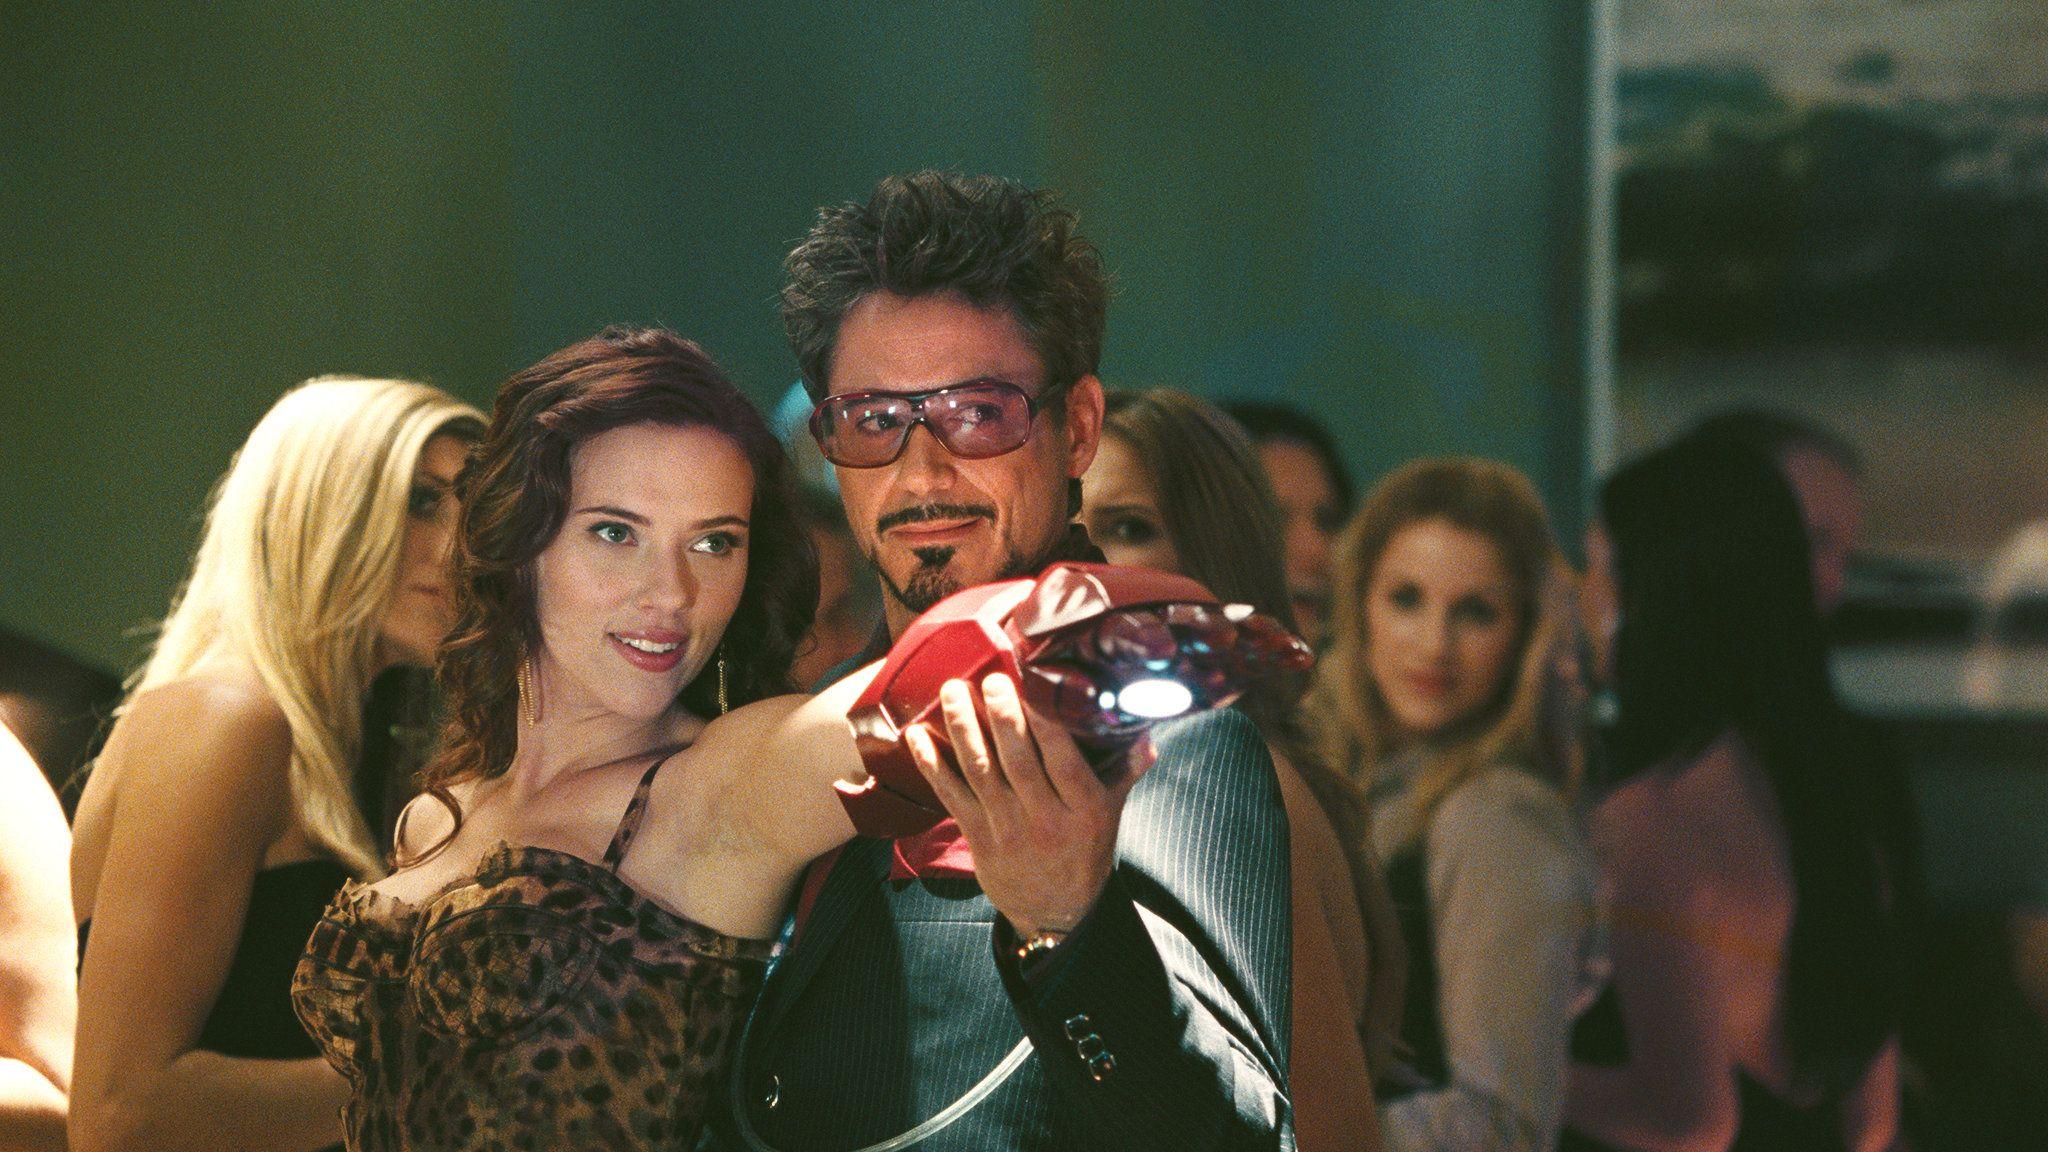 Iron Man star Robert Downey Jr responds to Black Widow cameo rumours